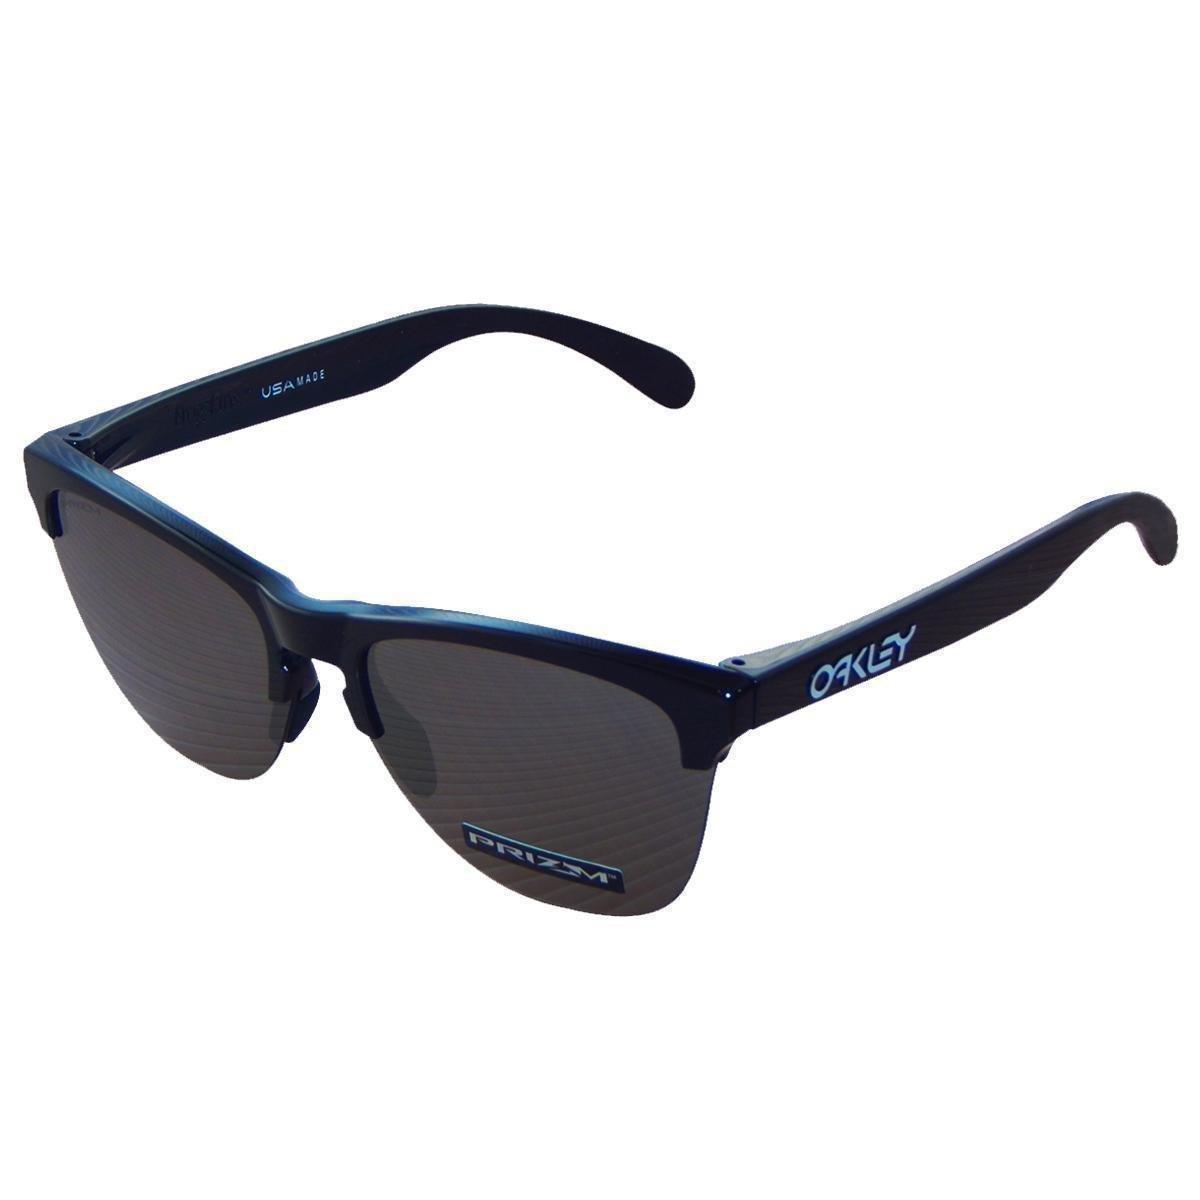 b55cbdbfeb973 Óculos Oakley Frogskins Lite Polished Black  Lente Prizm Black Iridium - Compre  Agora